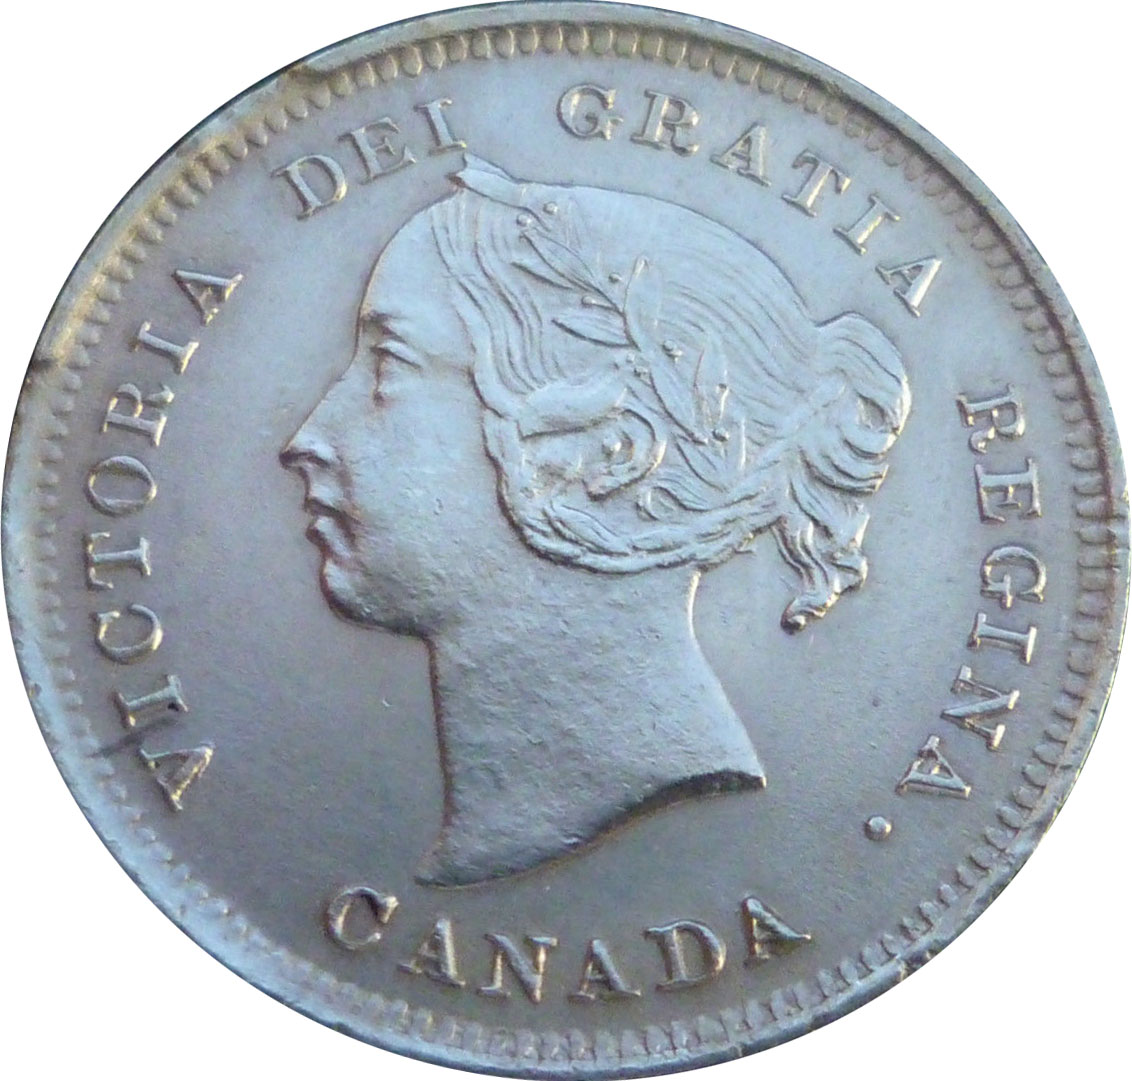 AU-50 - 5 cents 1858 to 1901 - Victoria